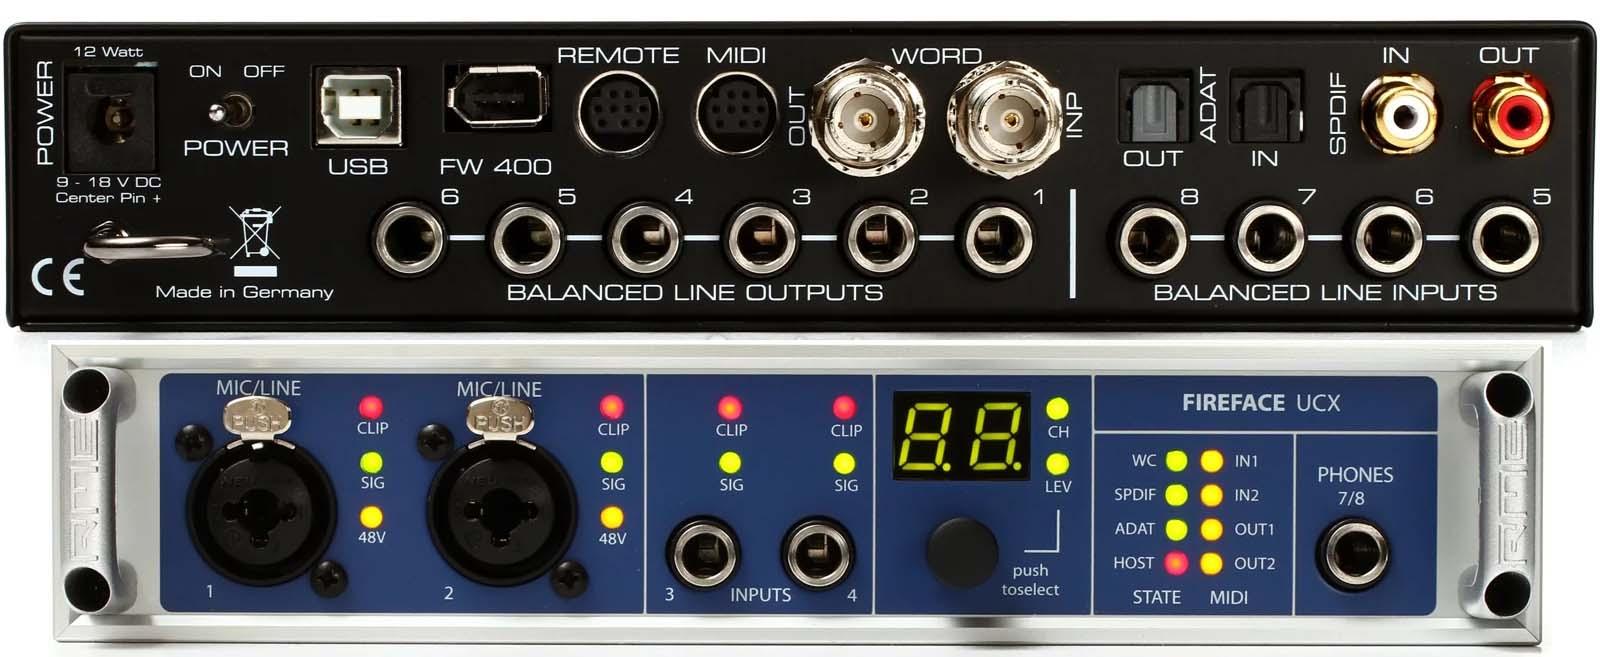 USB සහ FireWire සබඳතා, ADAT, S/PDIF පහසුකම් සහ Clock in/Out සහිත RME Fireface UCX